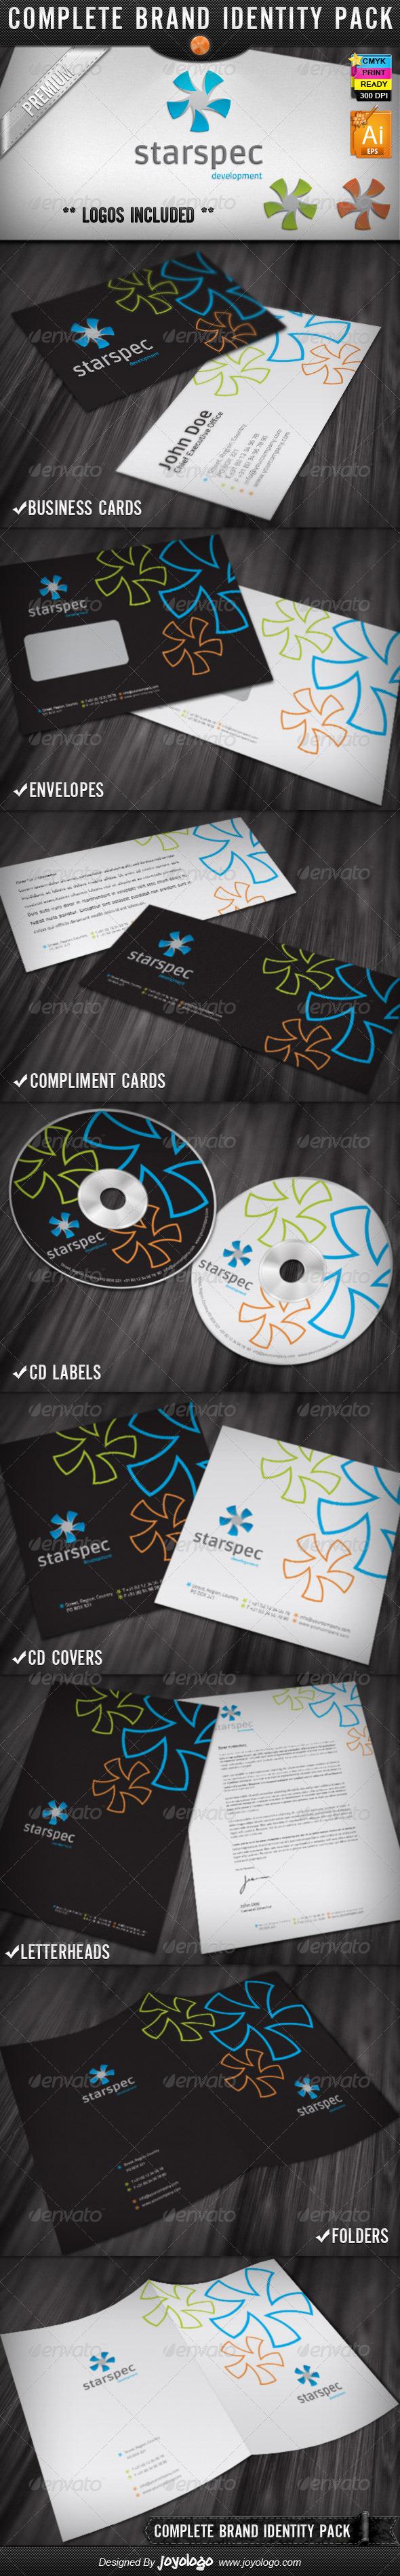 Star Spectrum Web Development Identity Designs - Stationery Print Templates